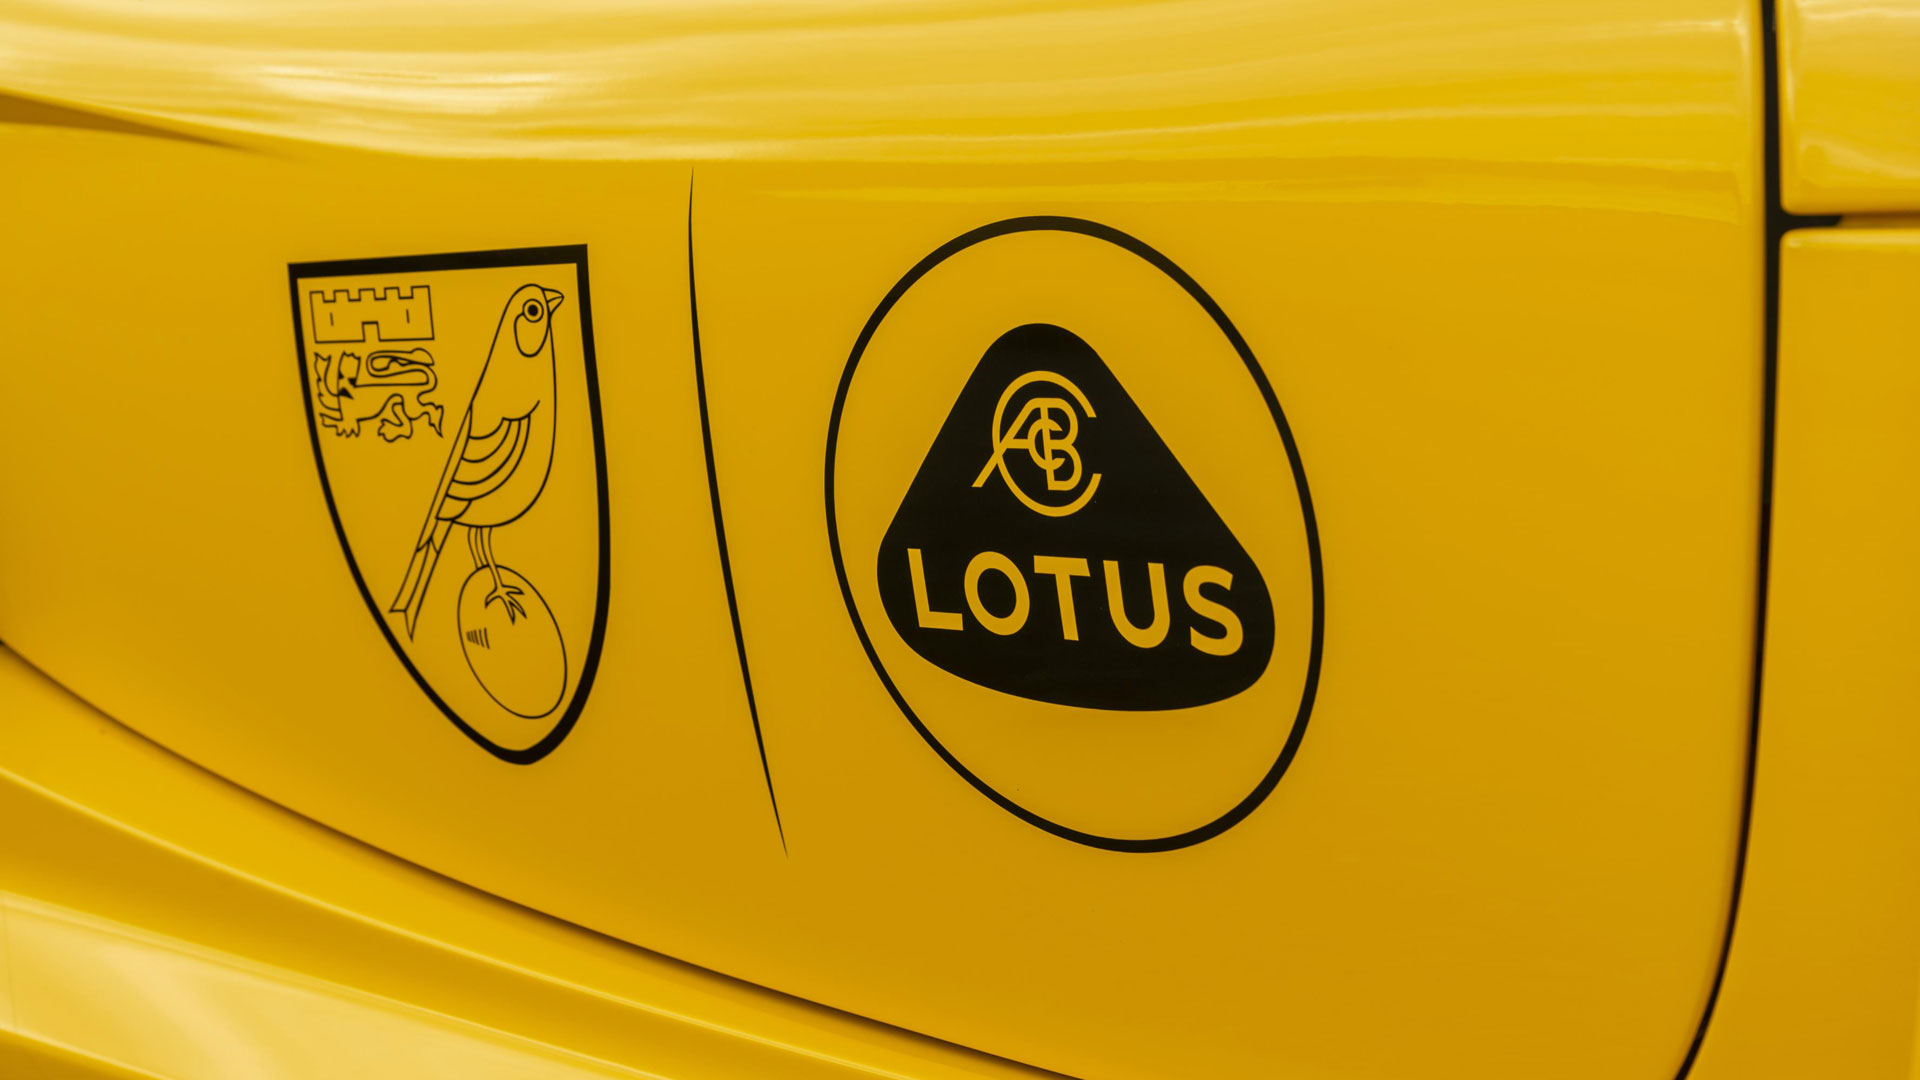 New Lotus branding Norwich City